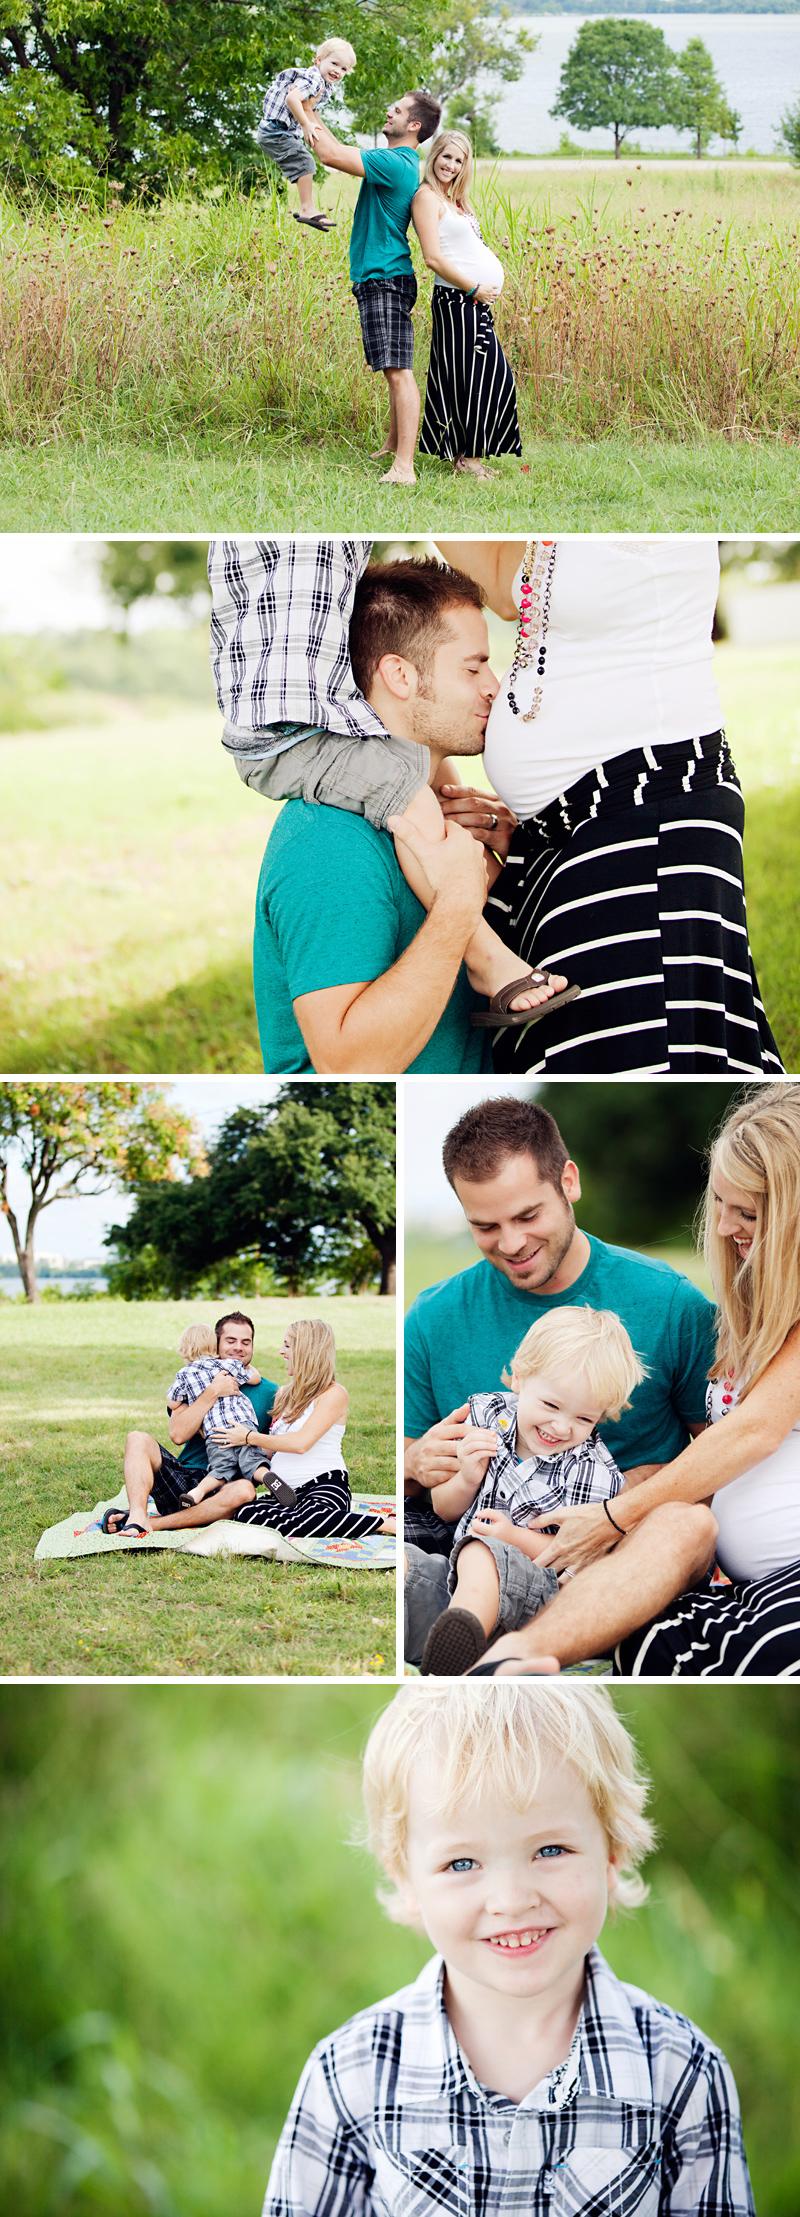 Dallas-Family-Photographerc001